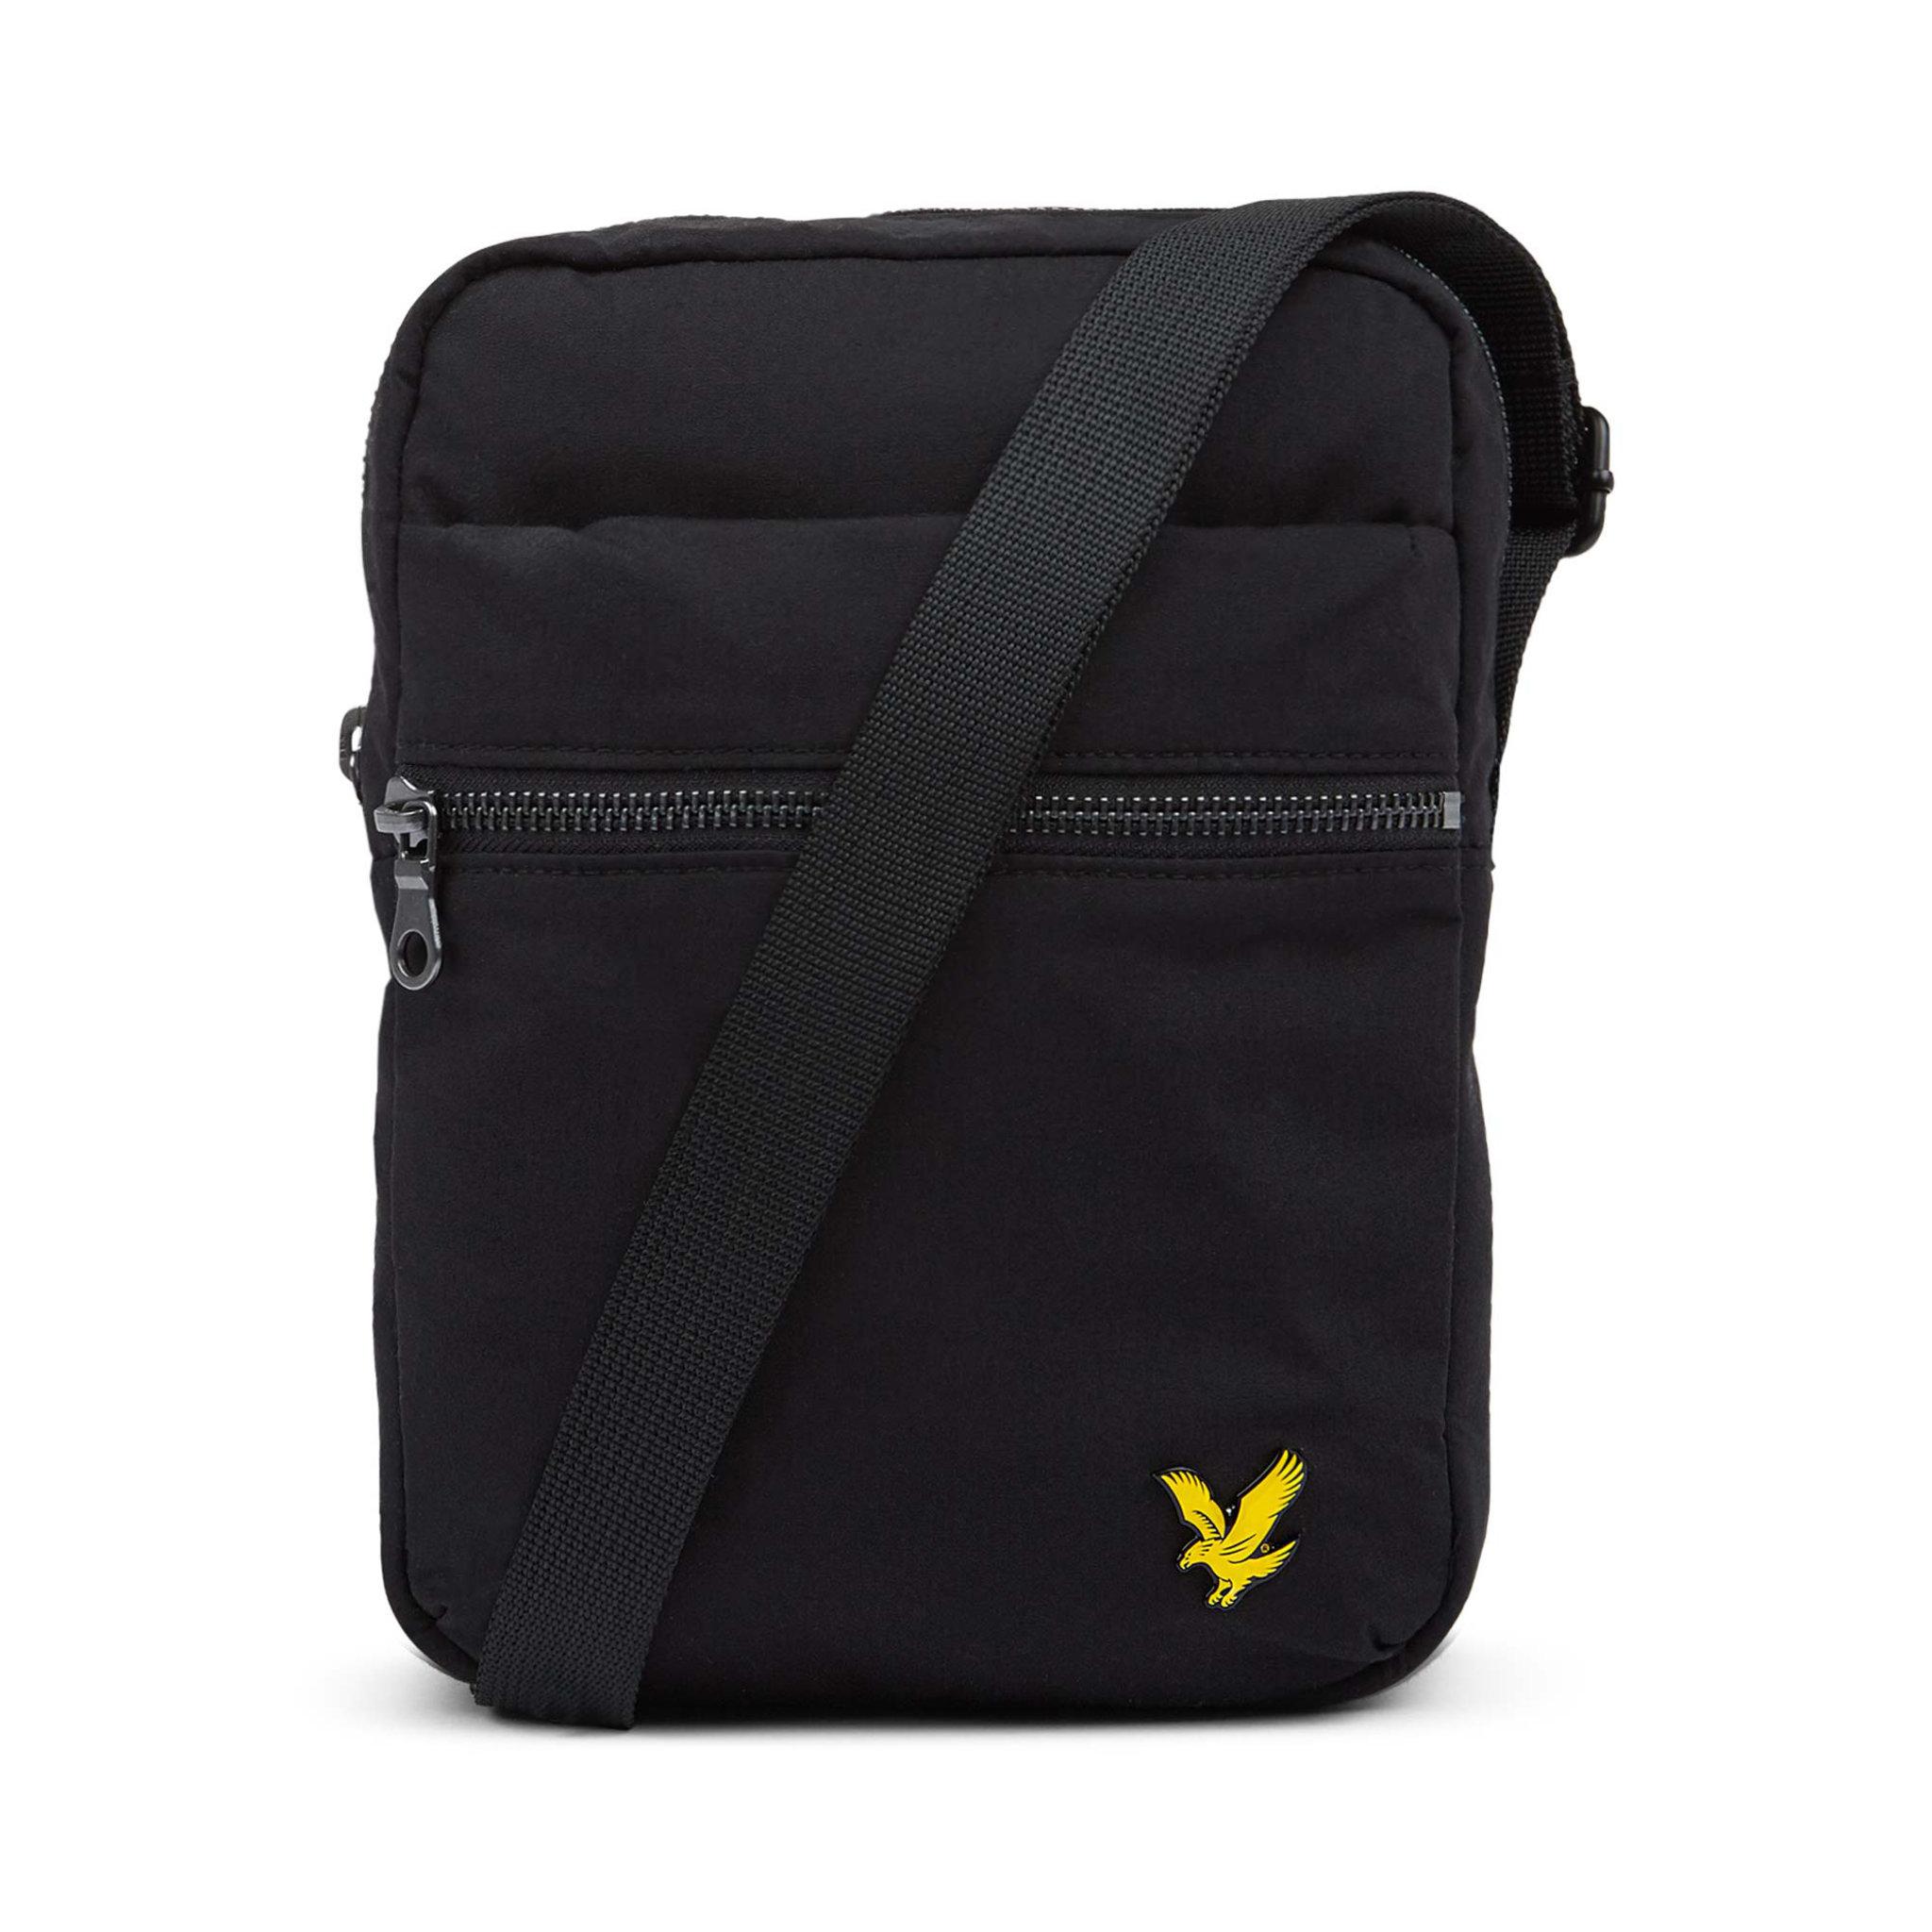 Small Items Bag, svart